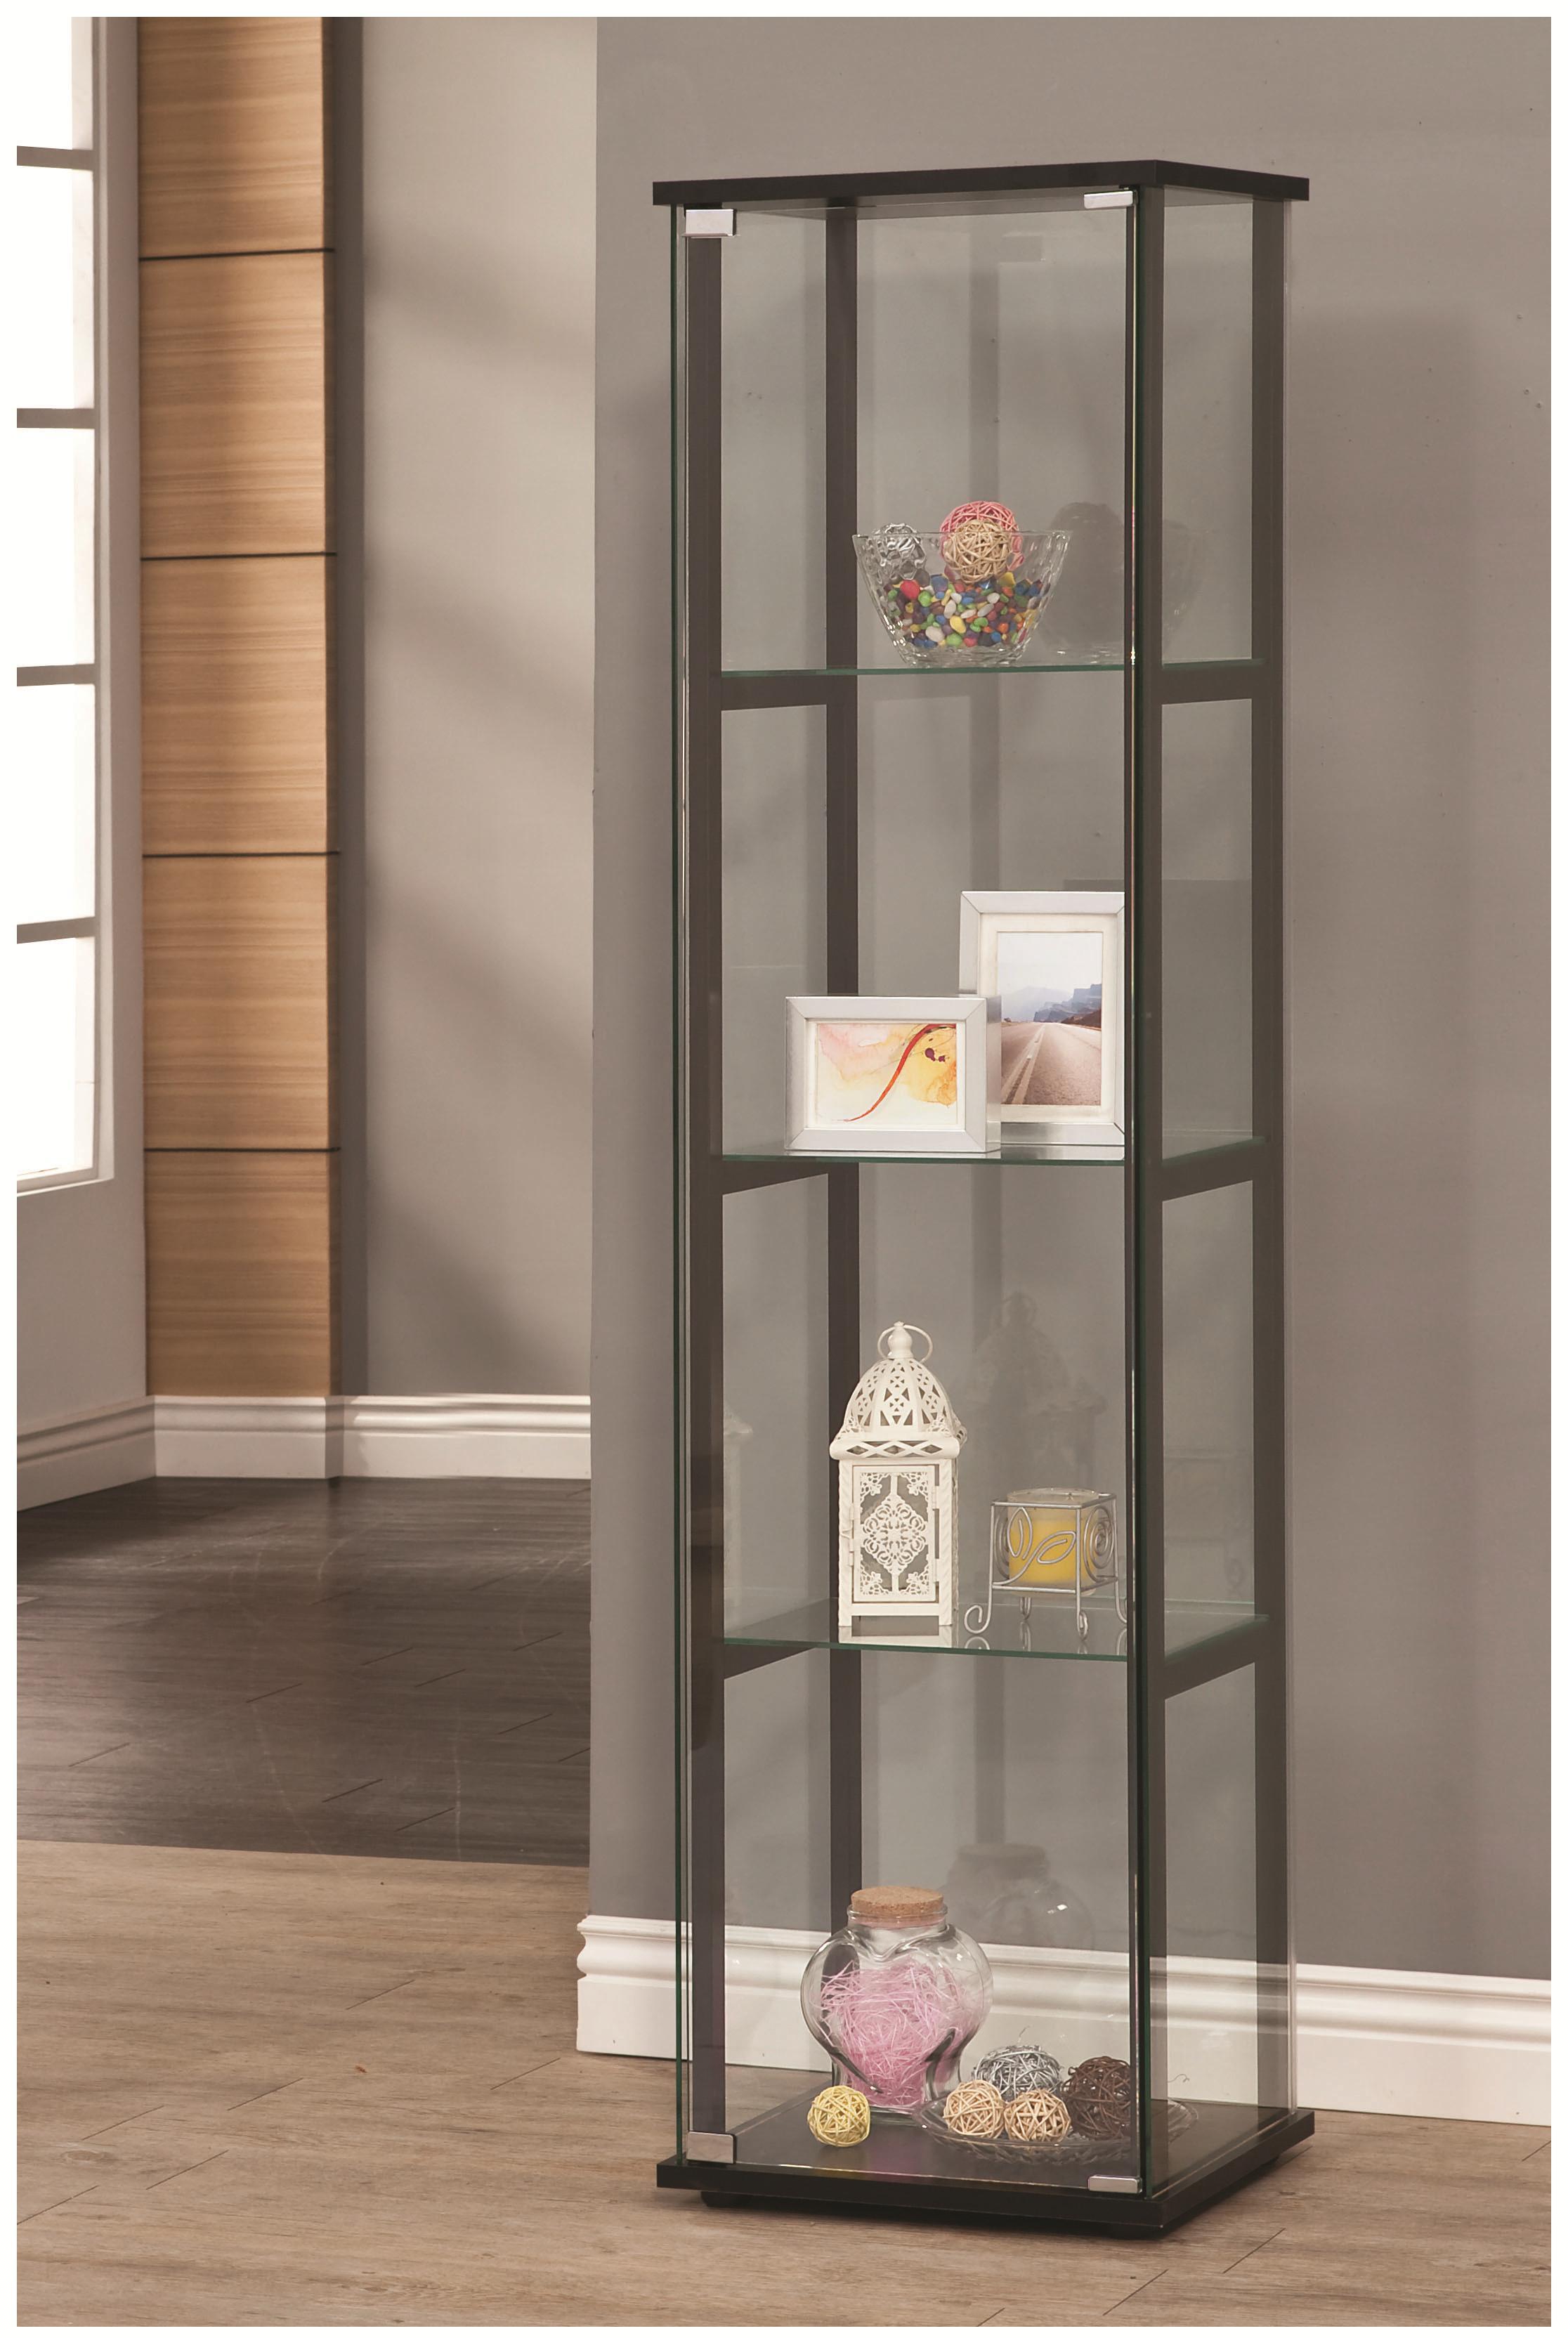 Coaster Curio Cabinets Curio Cabinet - Item Number: 950171